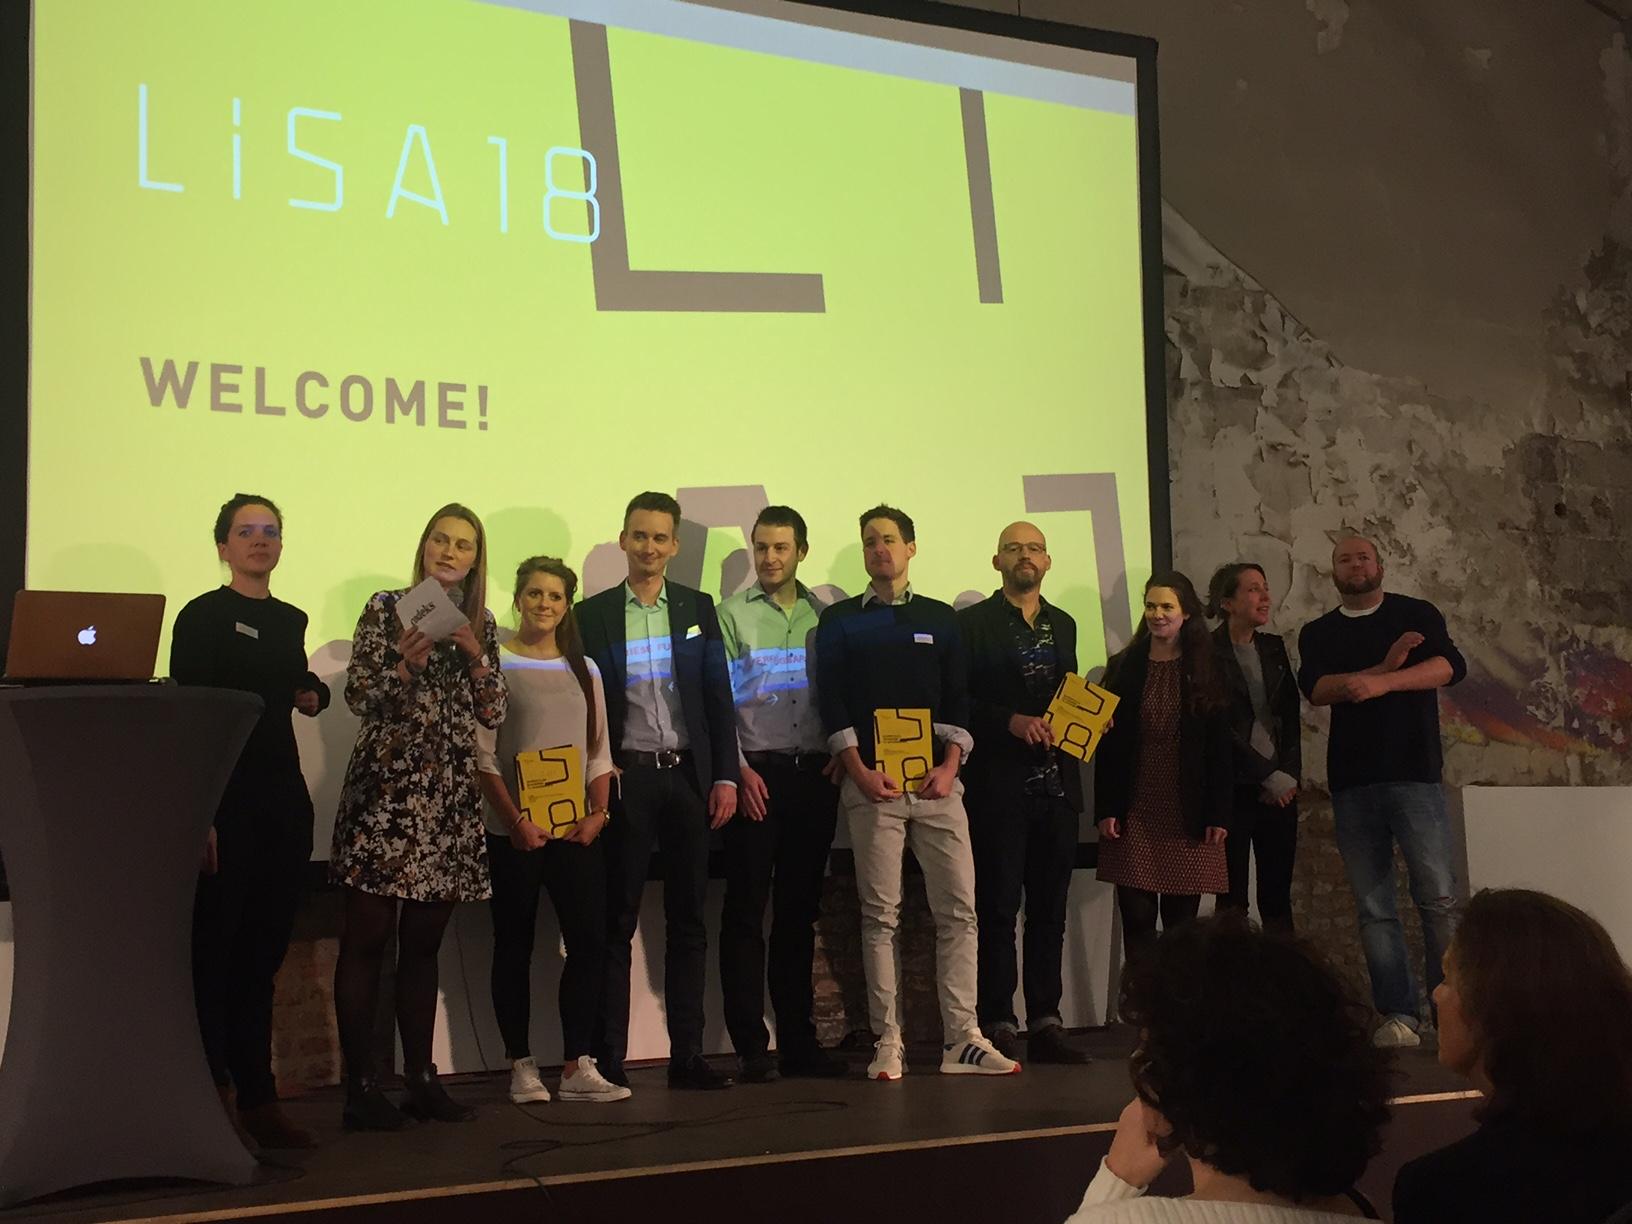 Designpreis Lisa 18 - Award Show